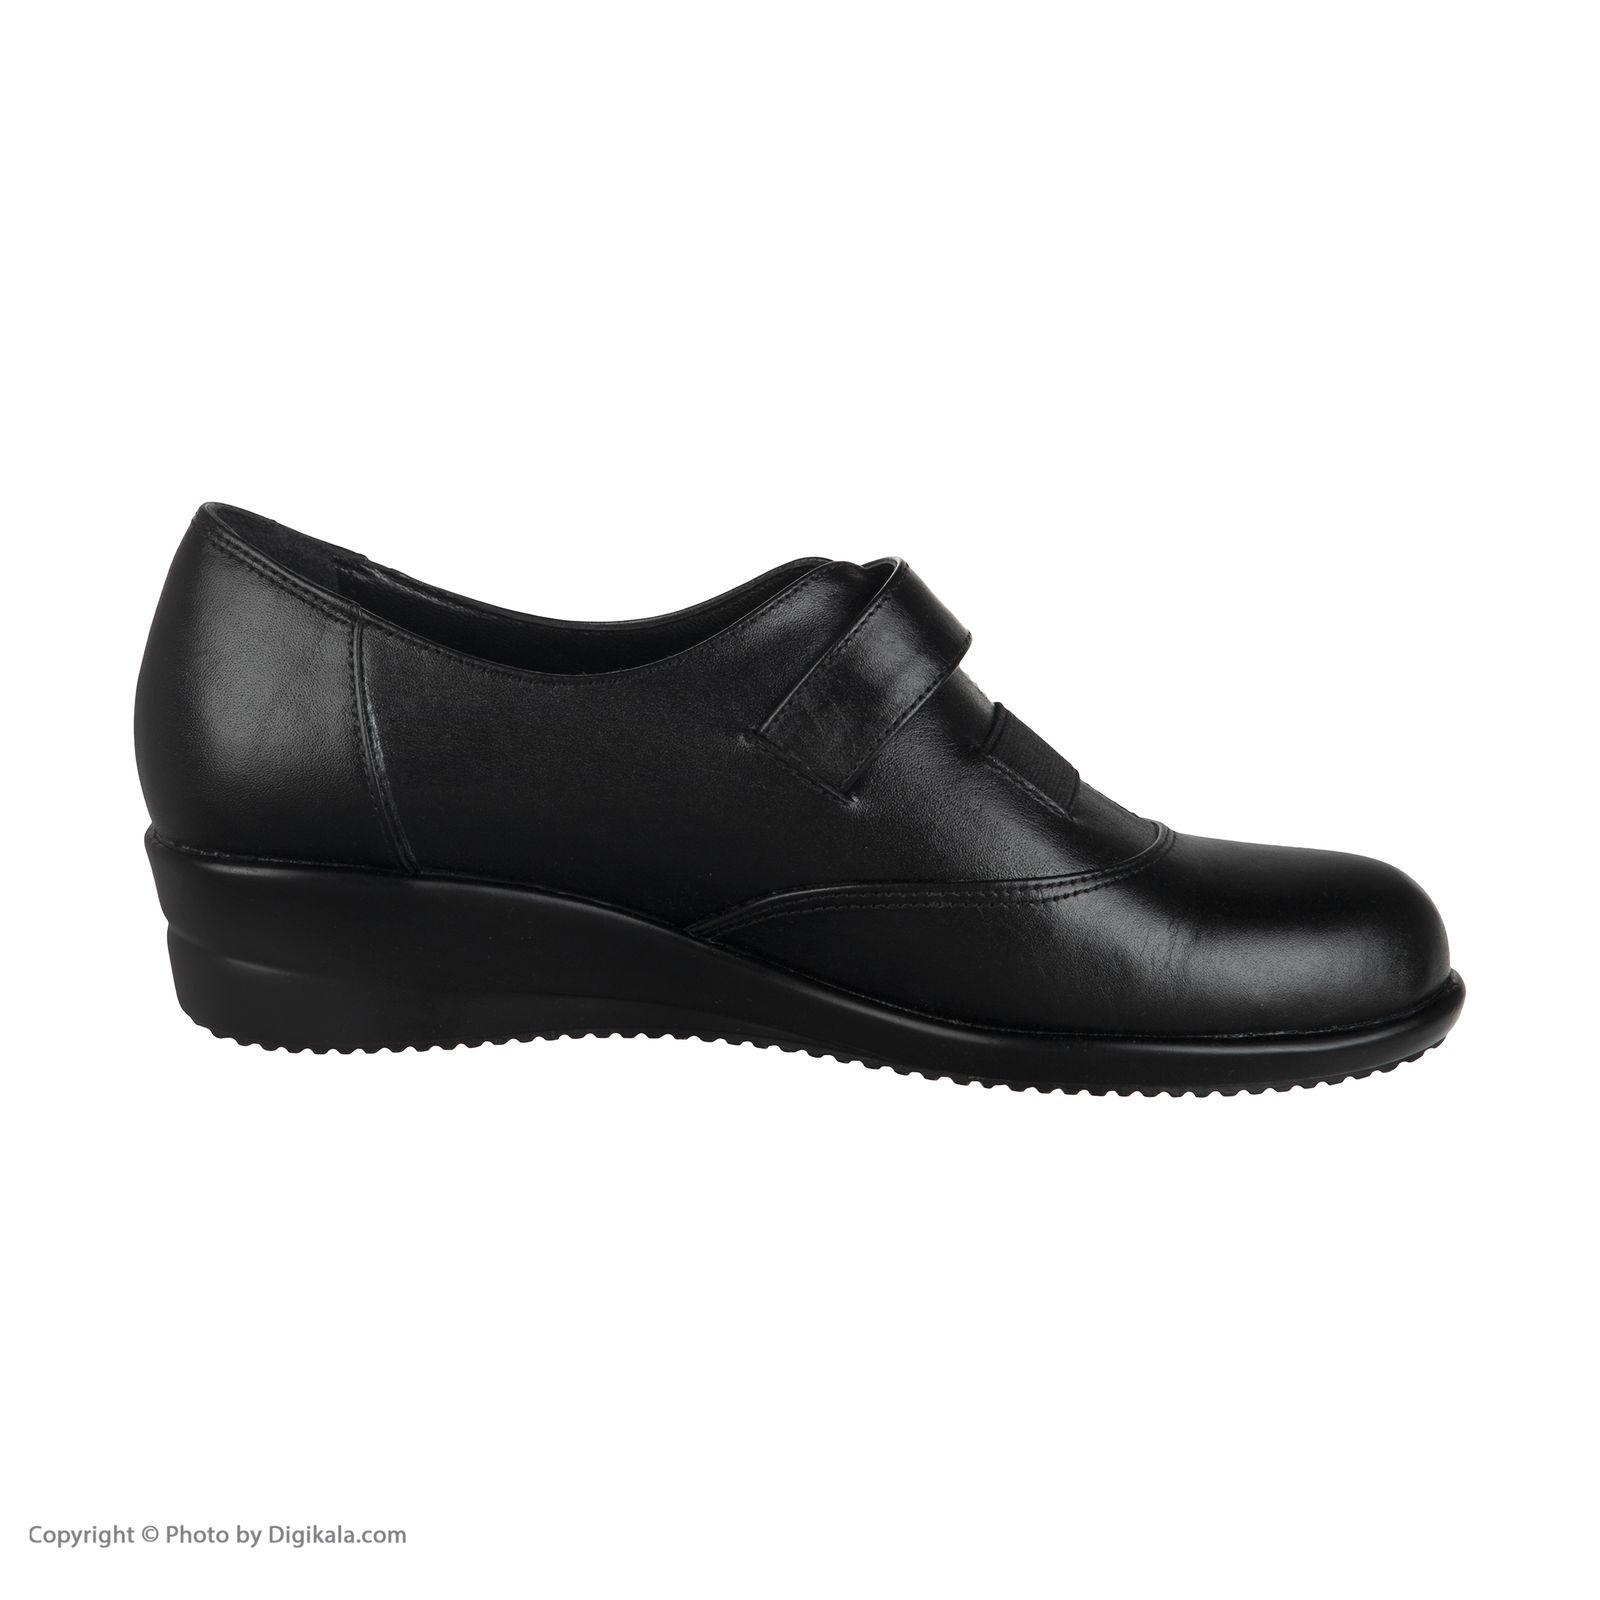 کفش روزمره زنانه سوته مدل 3070A500101 -  - 7